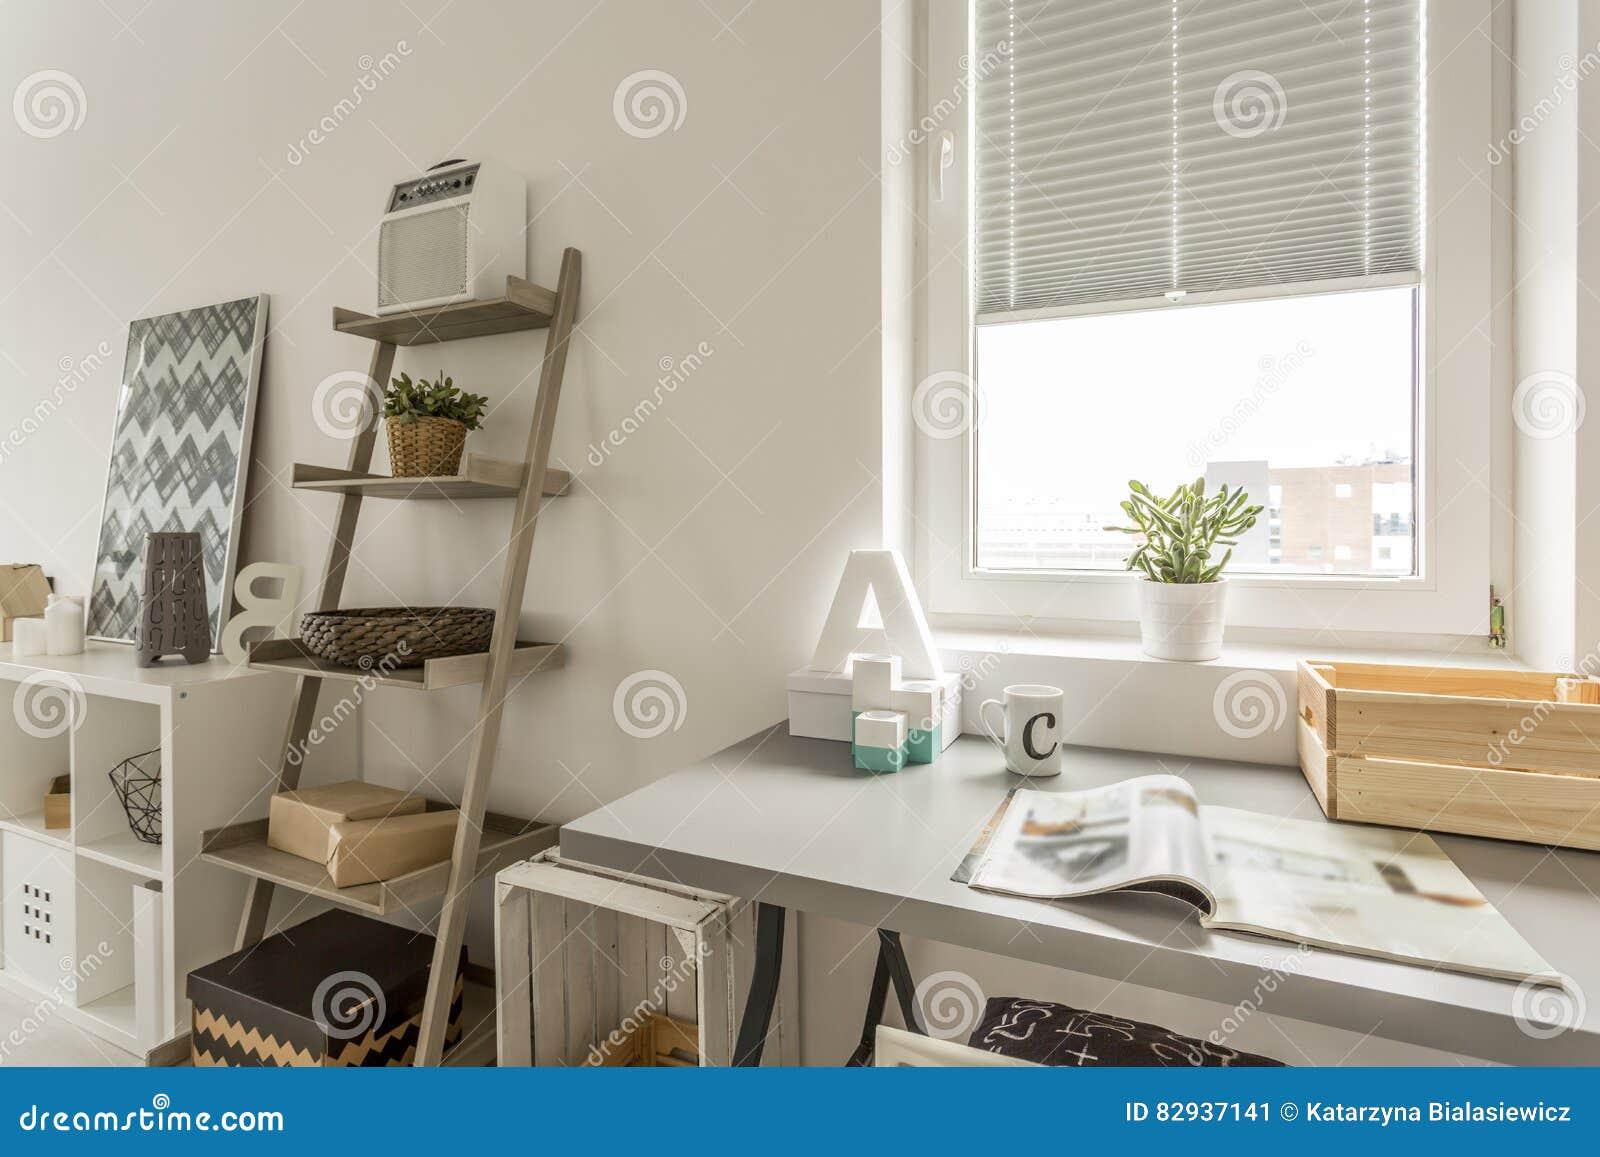 Bureau Voor Woonkamer. Interesting With Bureau Voor Woonkamer ...